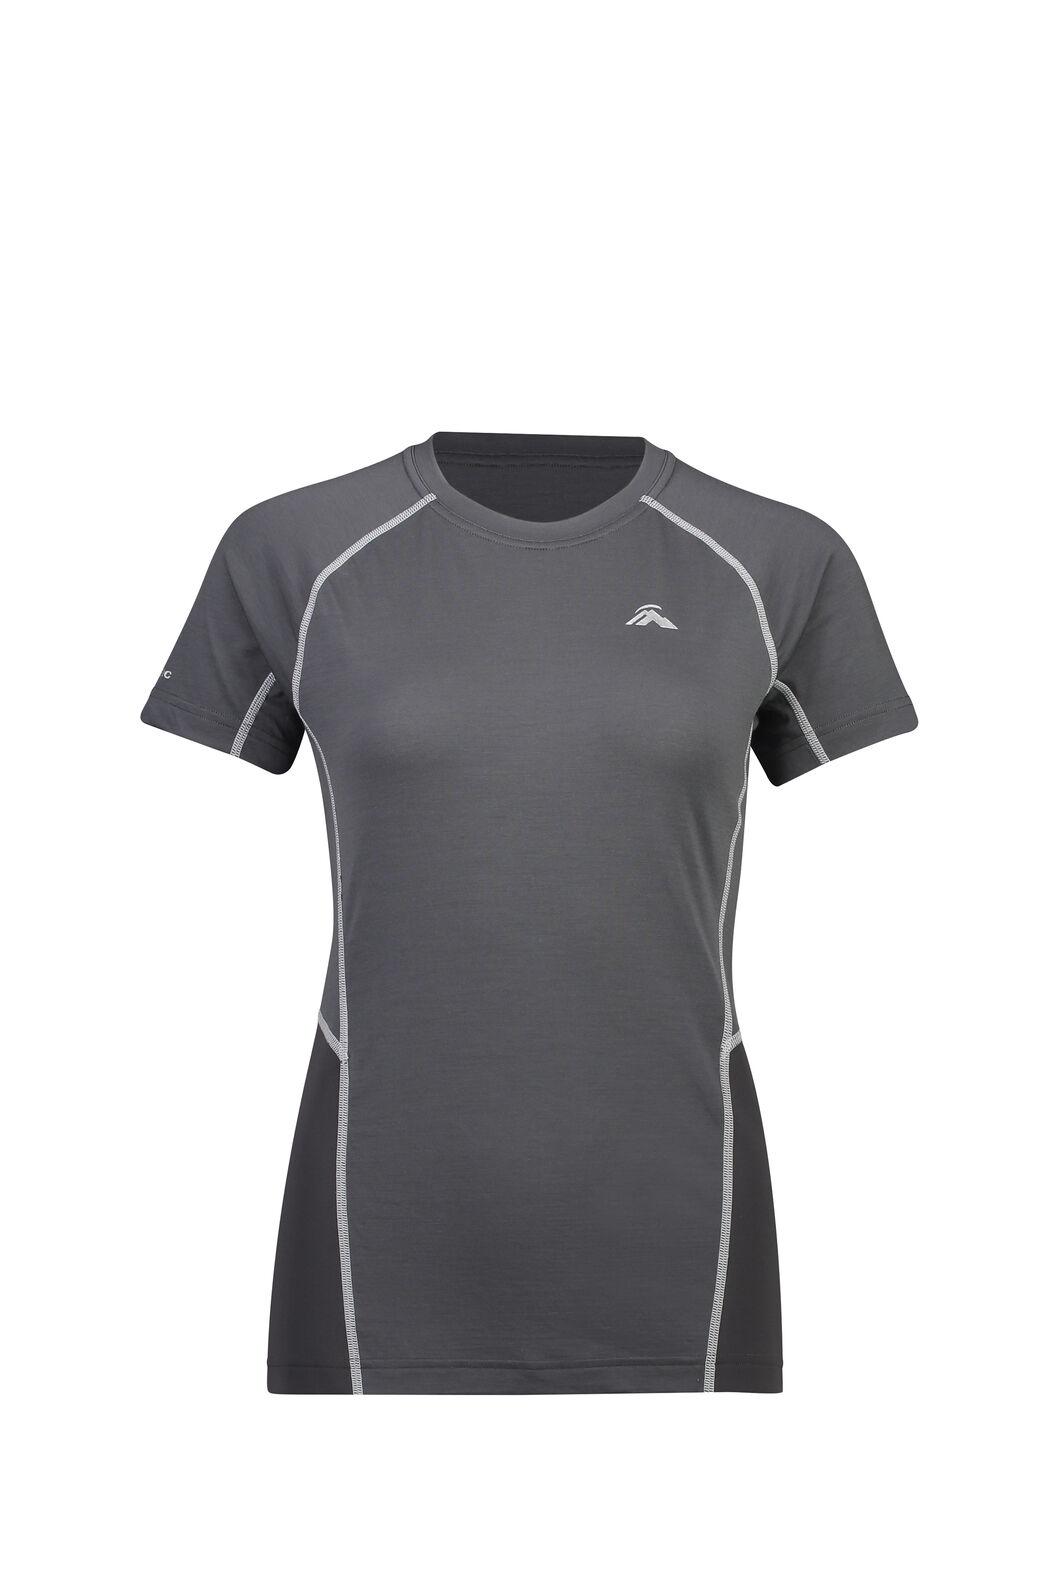 Macpac Casswell Short Sleeve Crew — Women's, Asphalt, hi-res